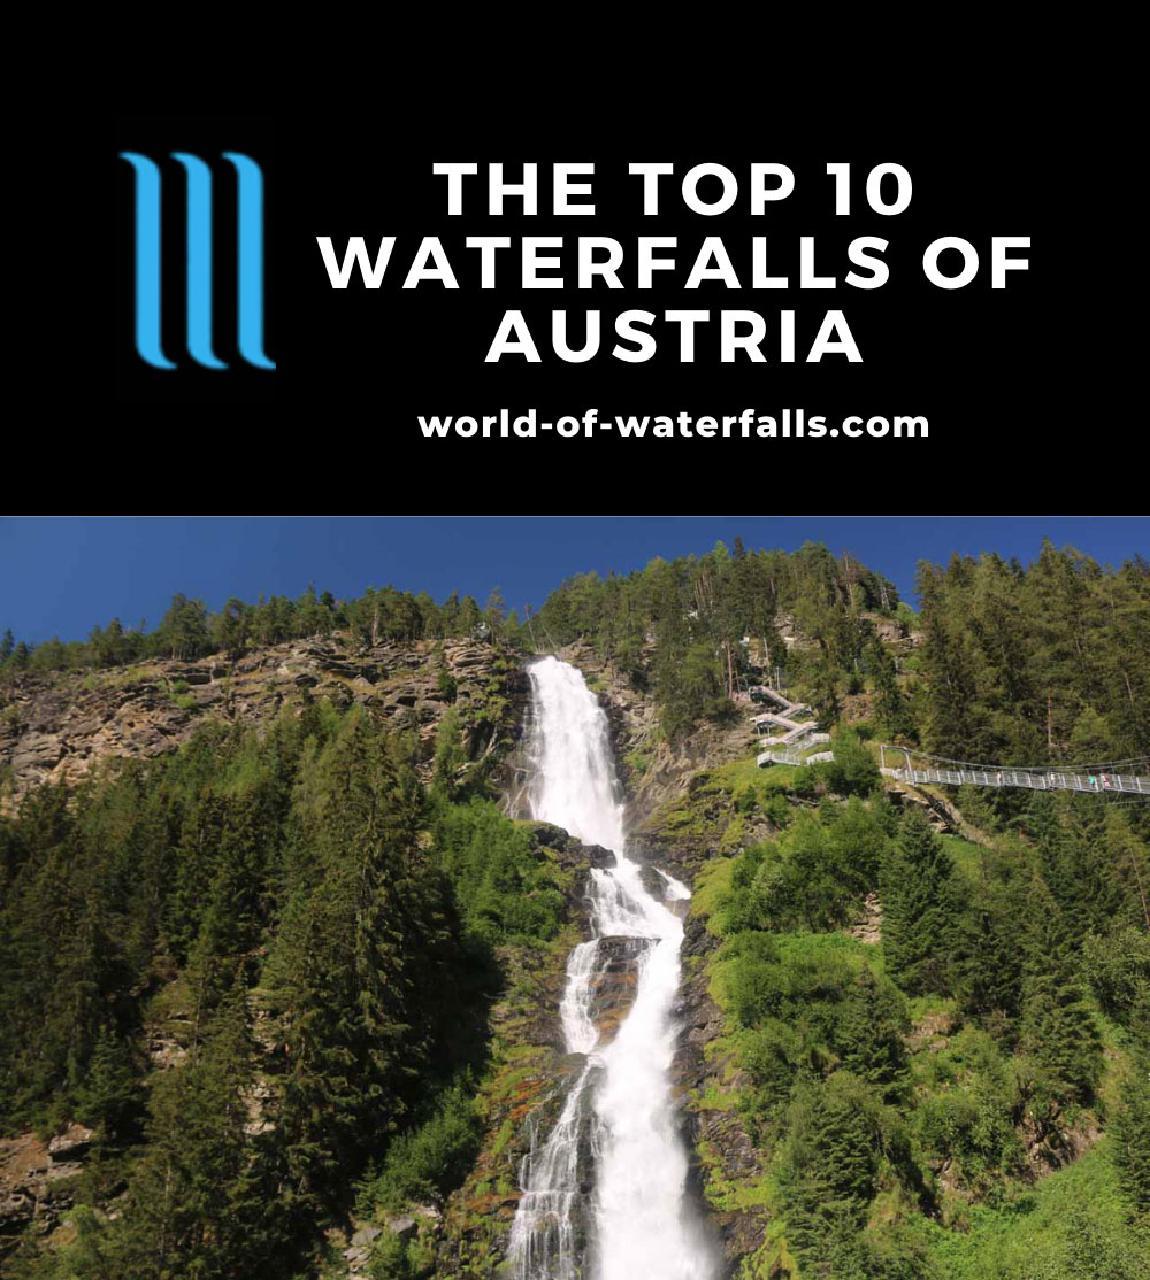 The Top 10 Waterfalls of Austria